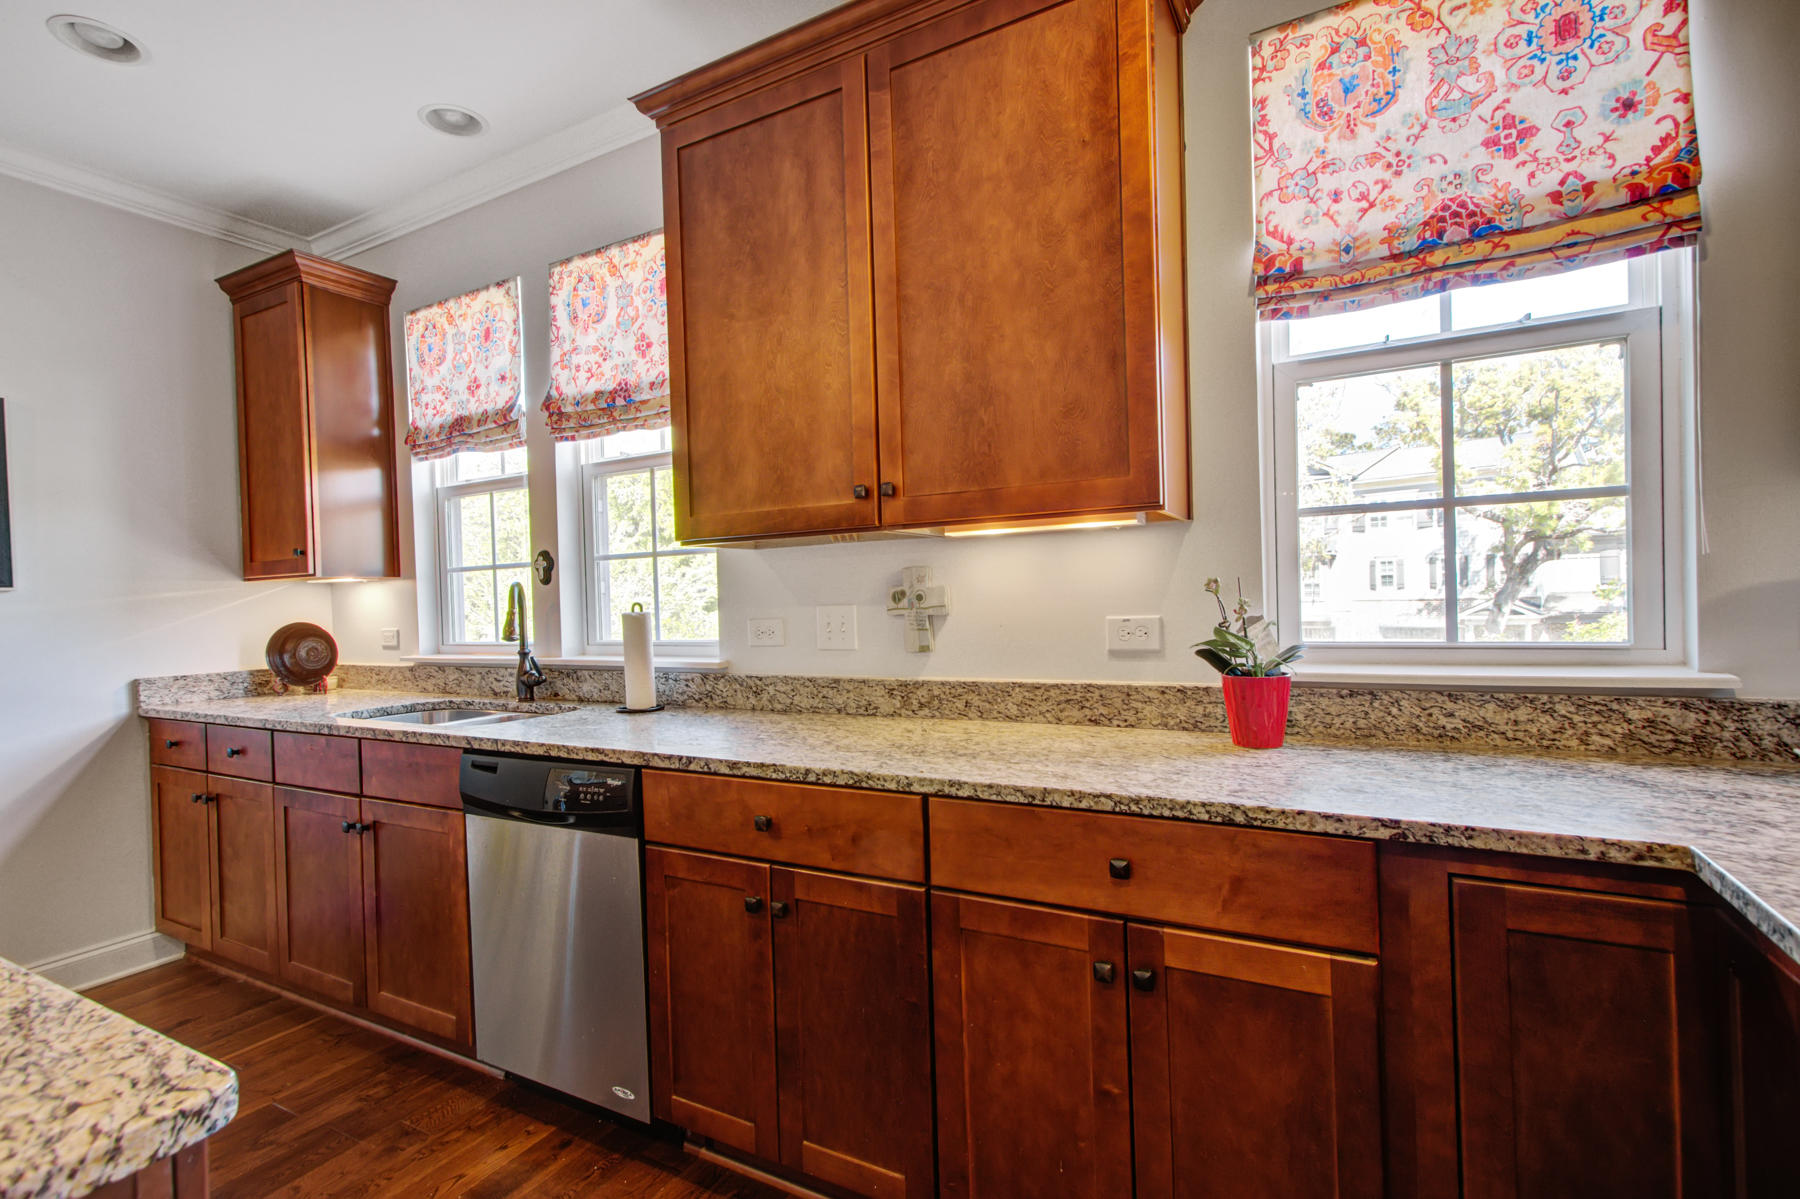 Etiwan Pointe Homes For Sale - 254 Slipper Shell, Mount Pleasant, SC - 17